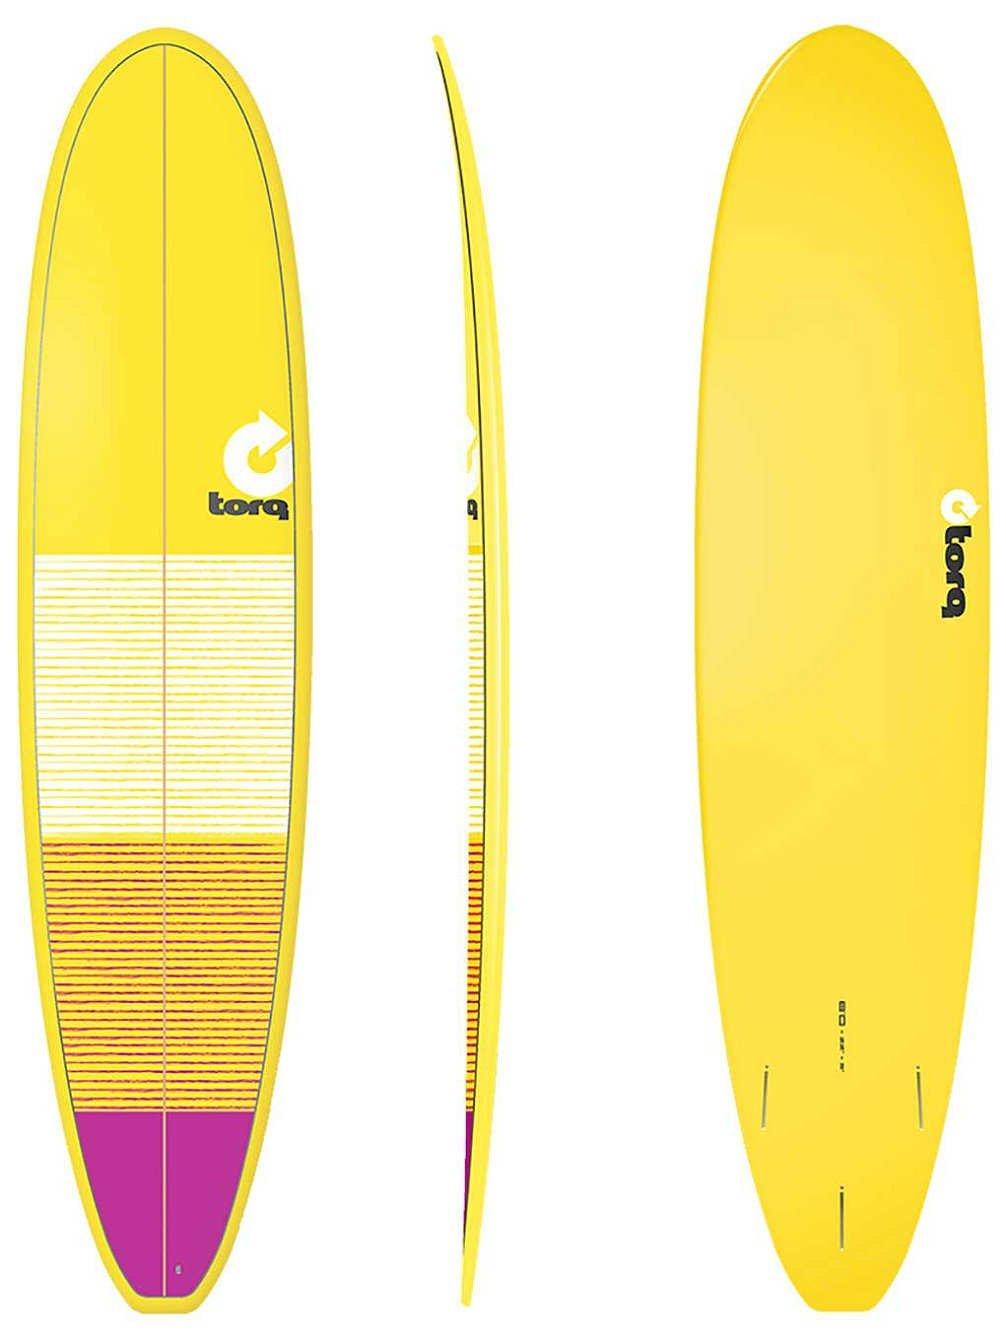 Tabla de Surf Torq epoxy Tet 8.0 Longboard Lines g: Amazon.es ...